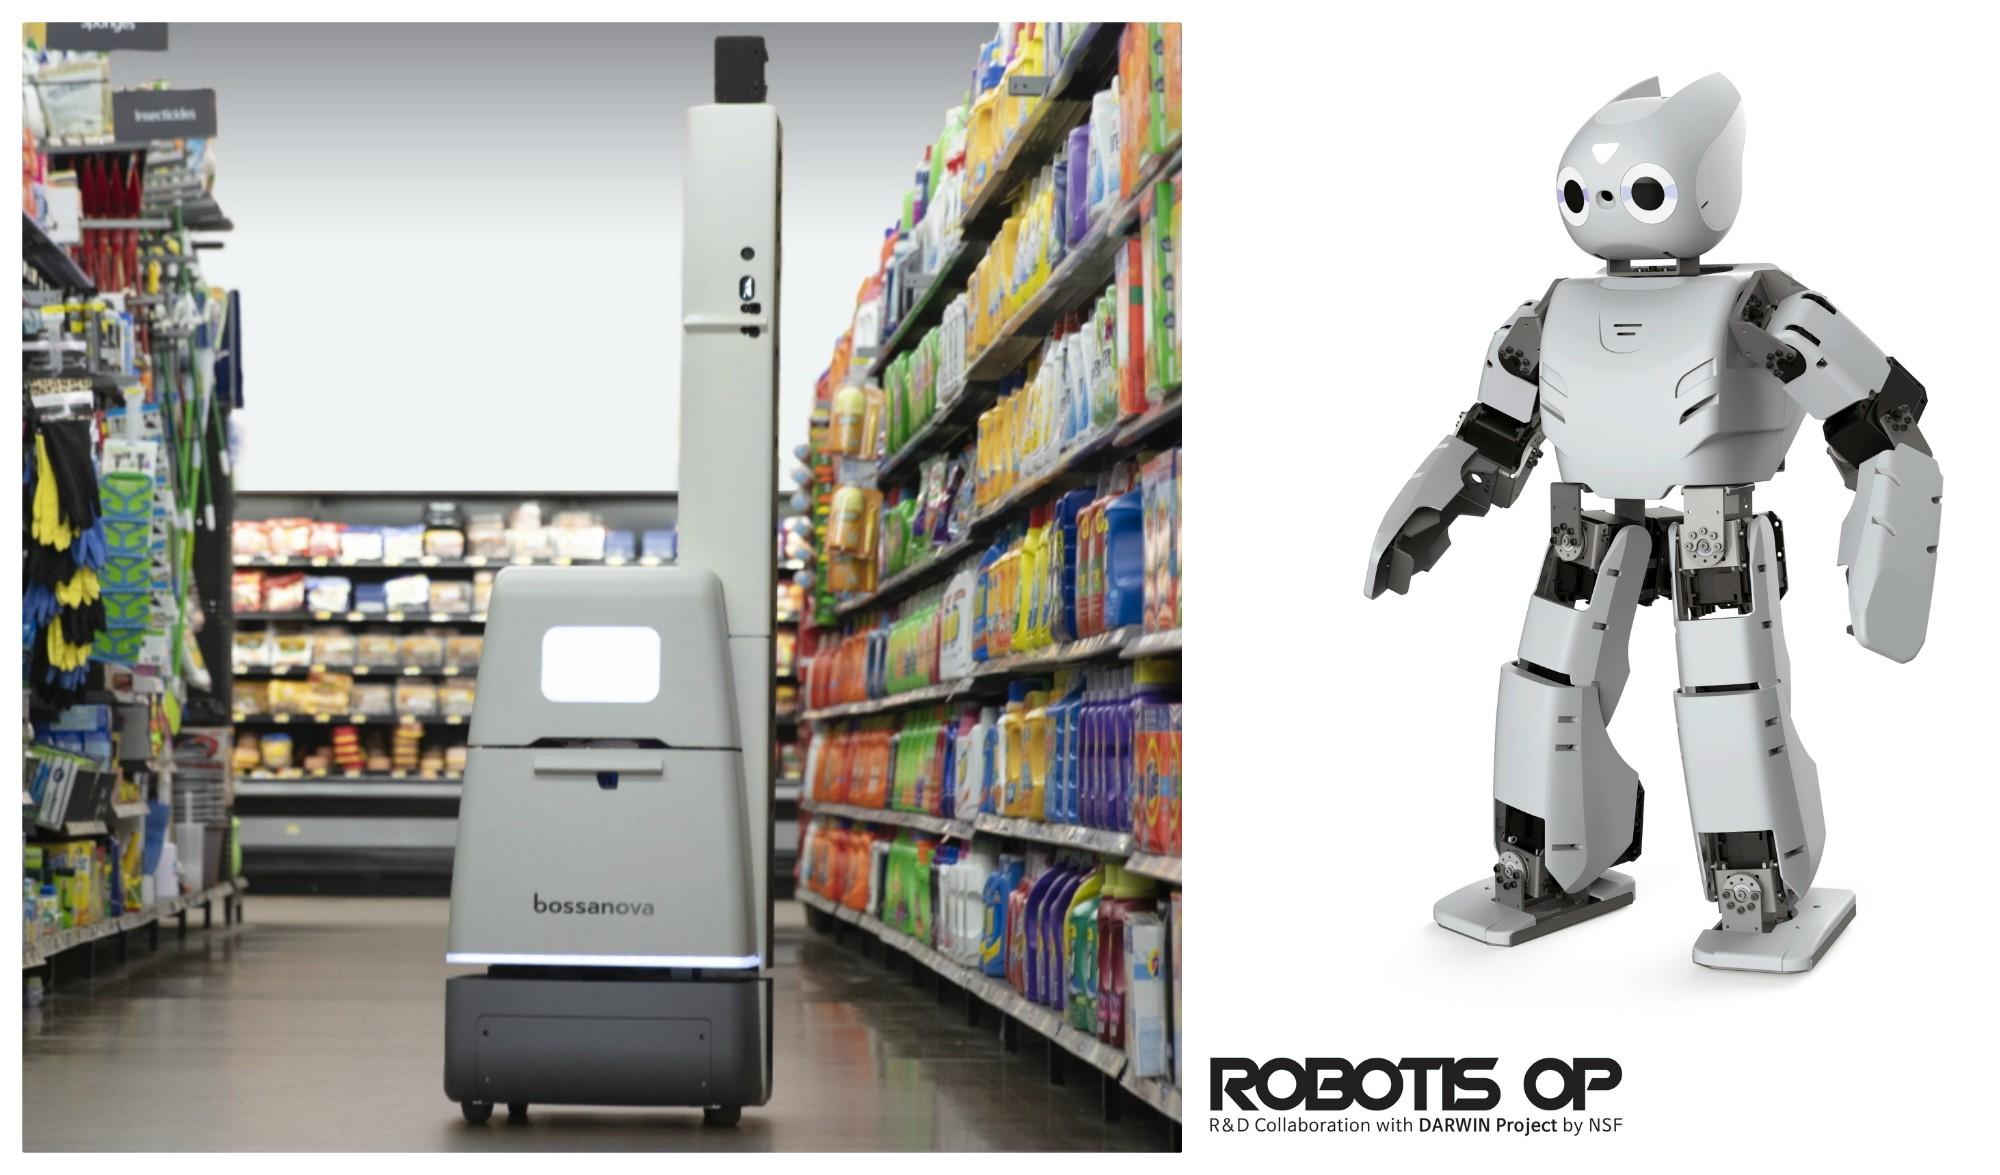 Lg expands investments in robot innovators hashtag dubai jpg 2000x1175 Nova  robot 64f4a626b